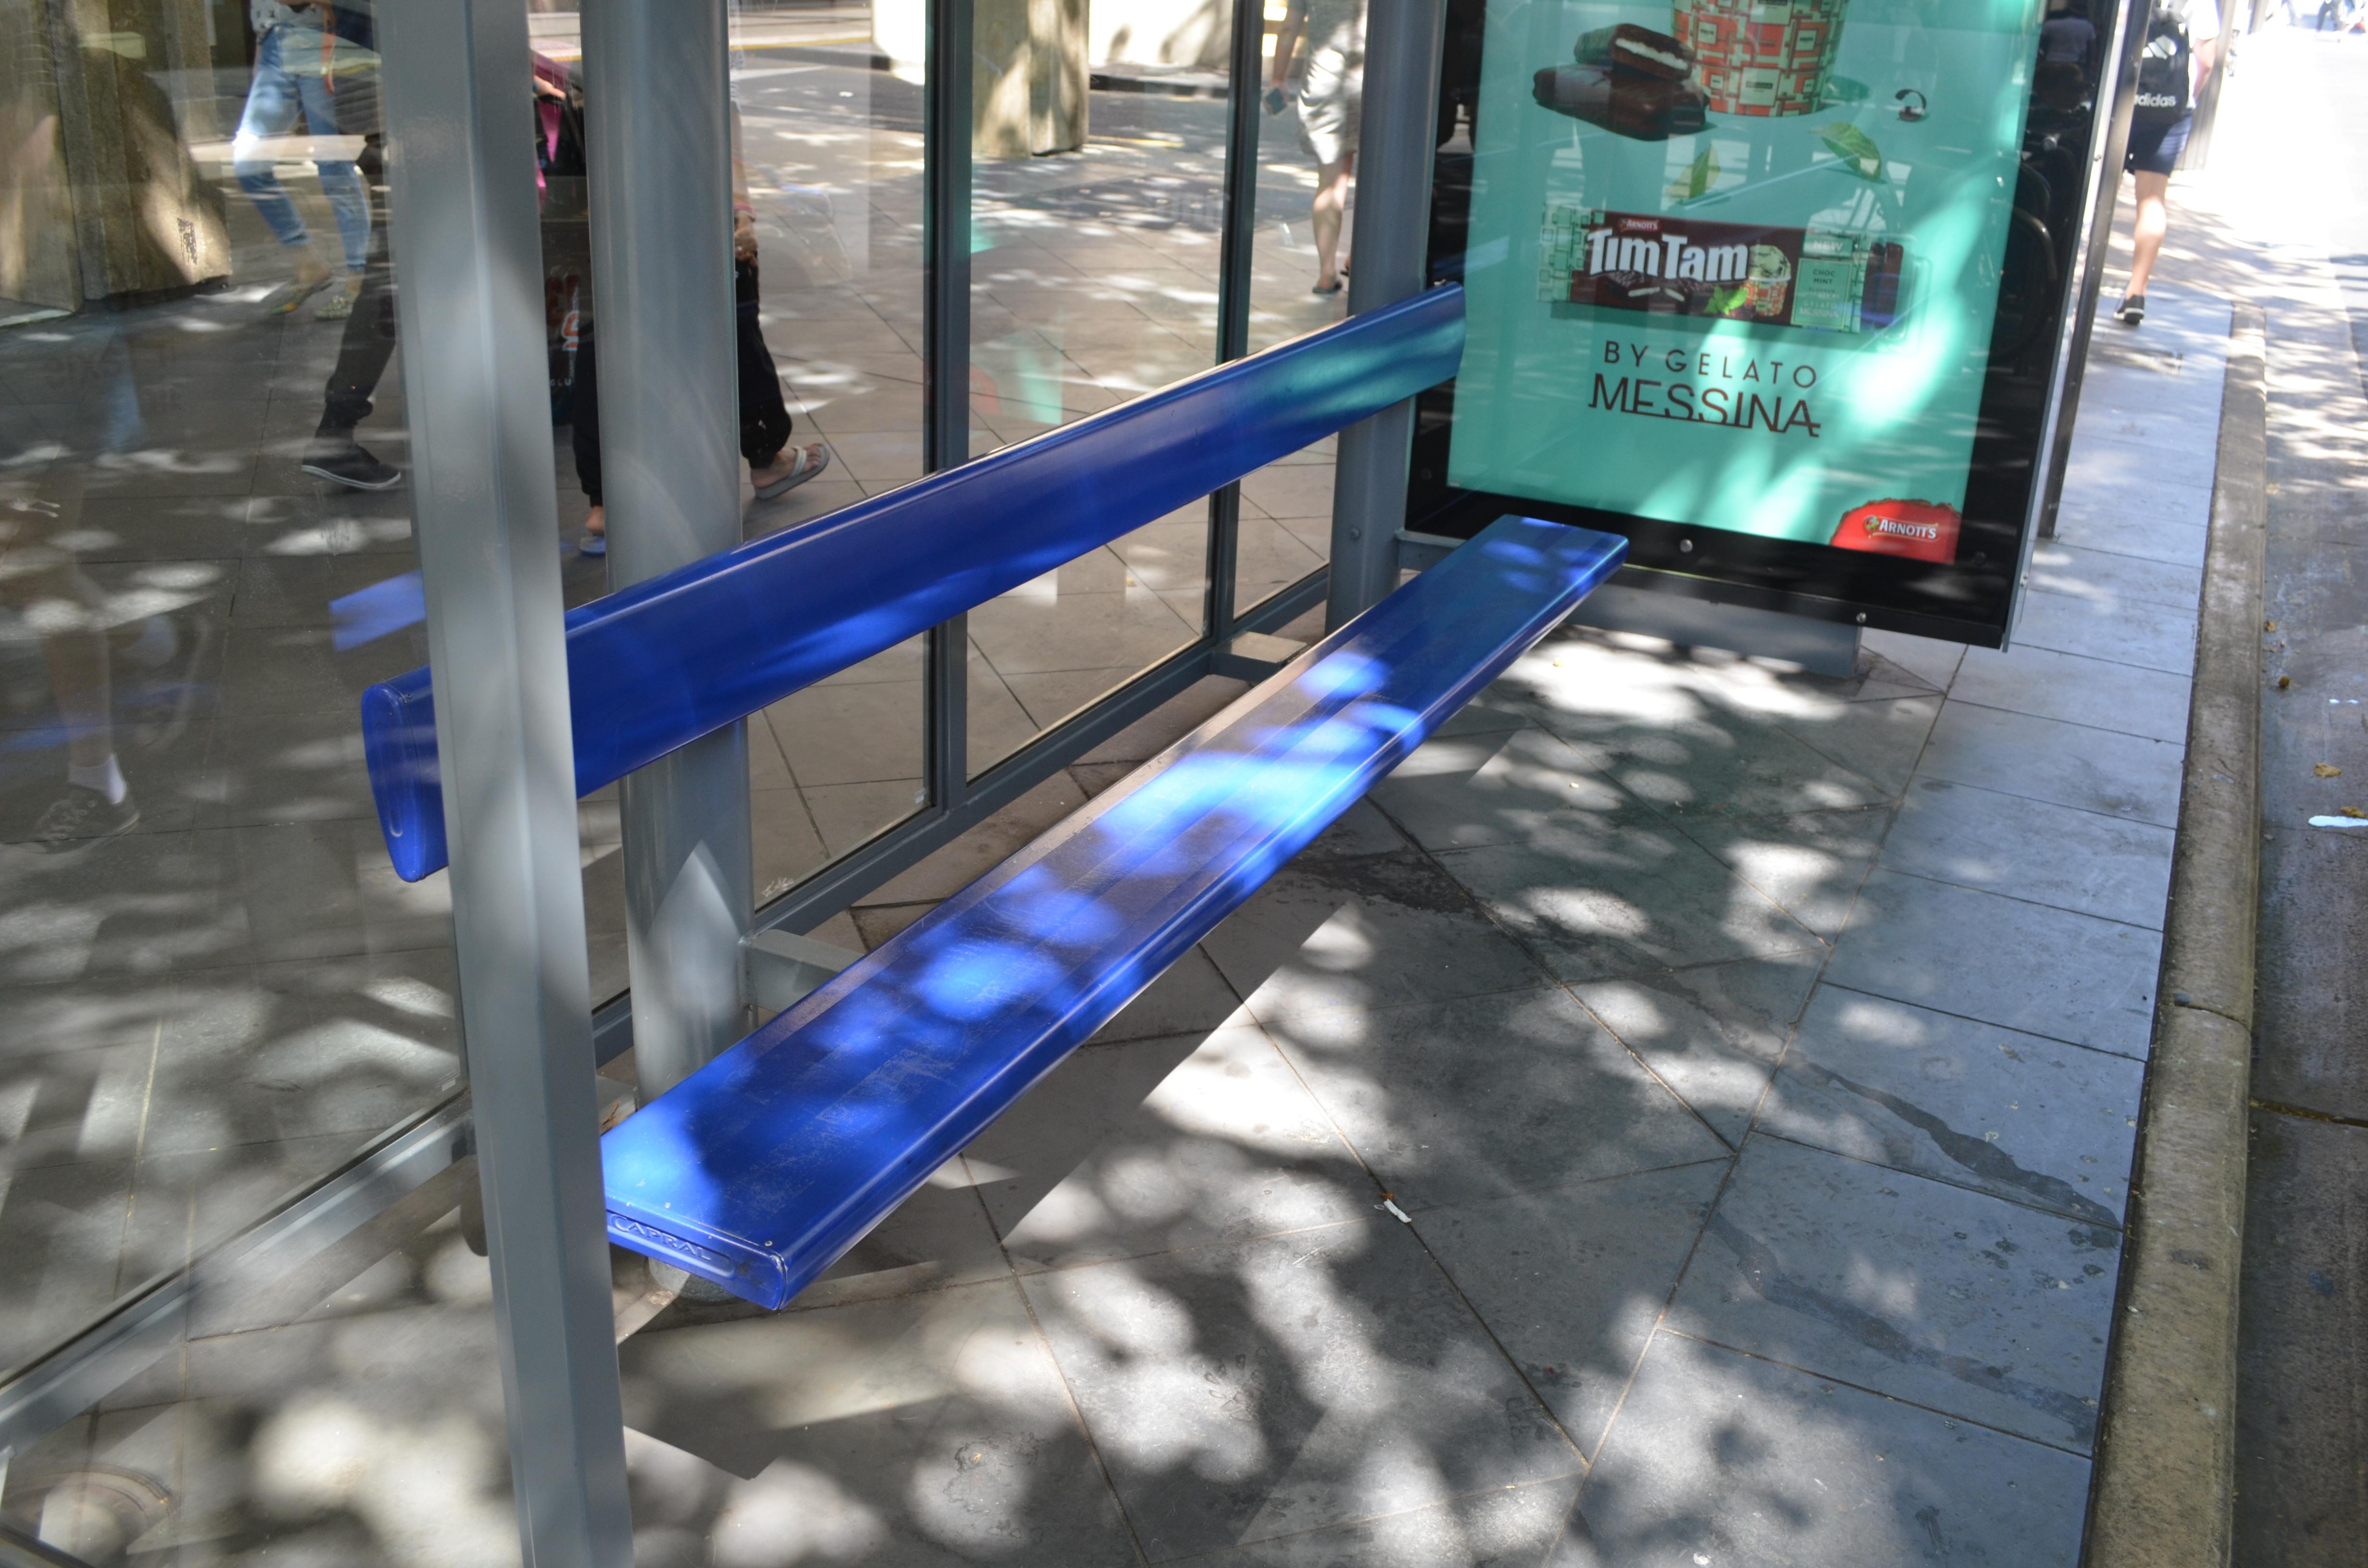 Thin metal bus stop seats.